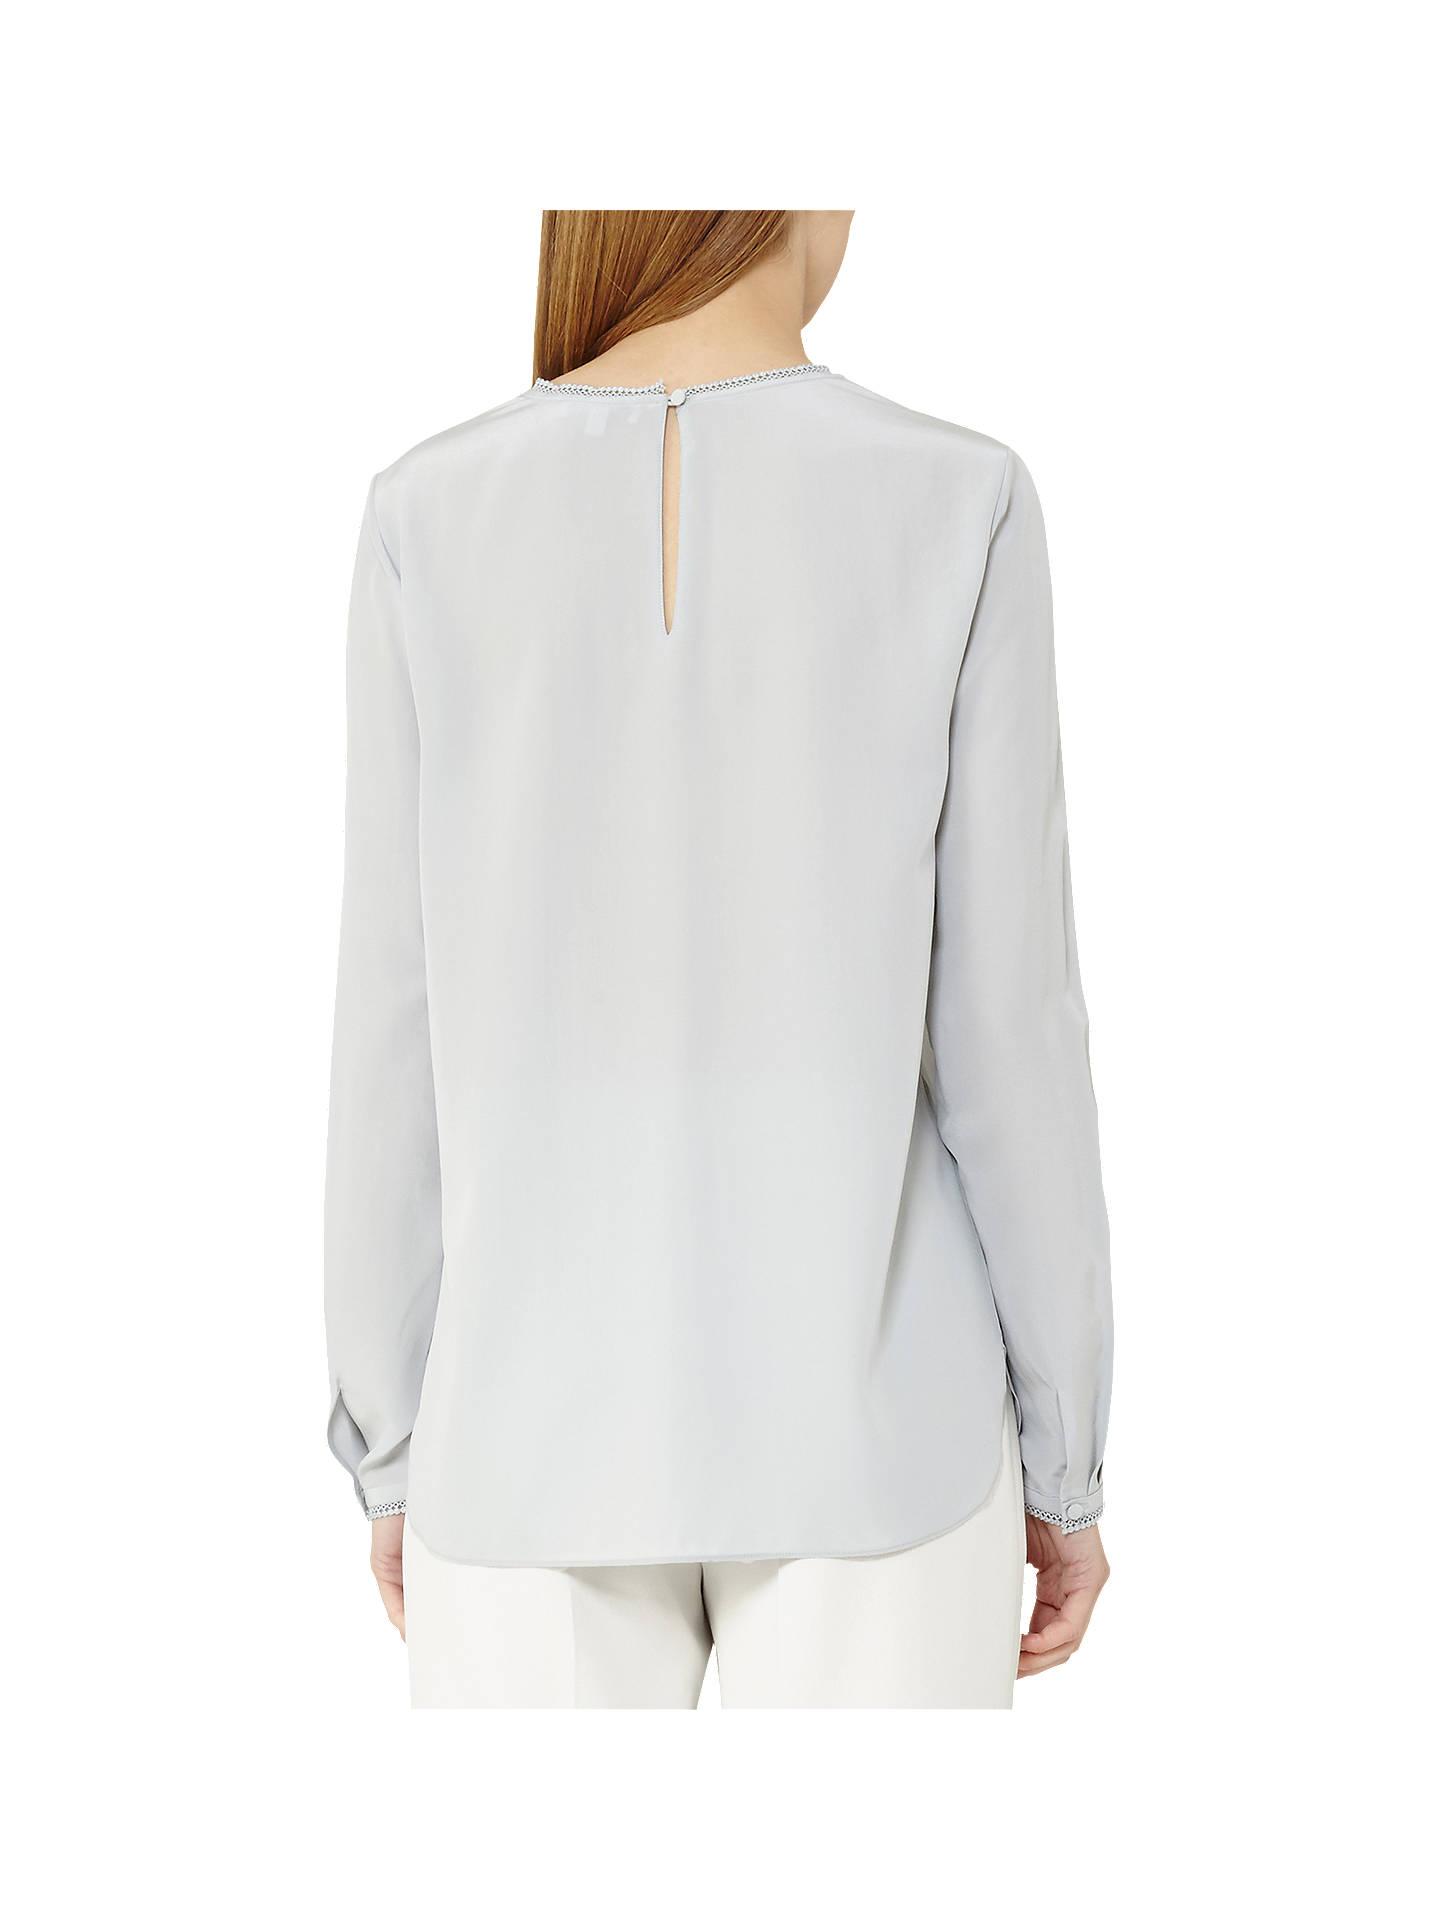 45f62ec307698 Buy Reiss Juna Lace Trim Silk Blouse